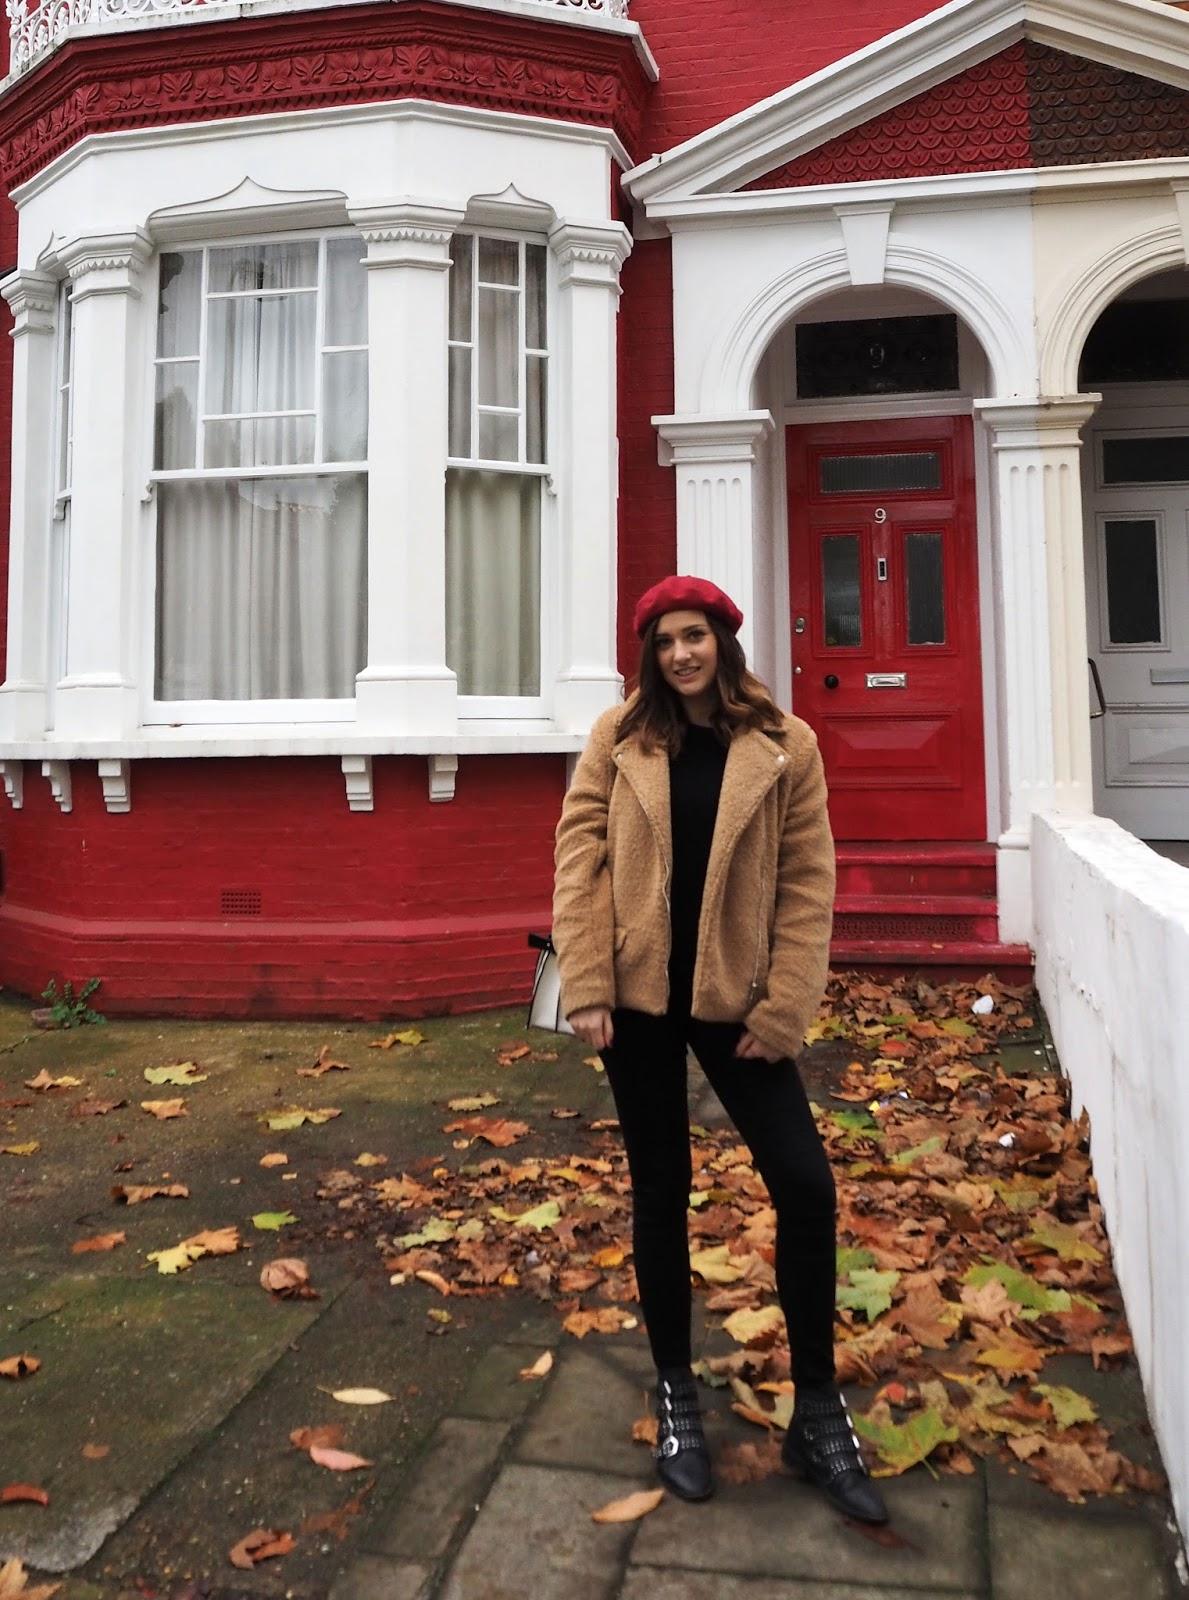 The Teddy Bear Coat Missguided - LAUREN ROSE STYLE - Autumn Style Fashion Blogger - London Street Style